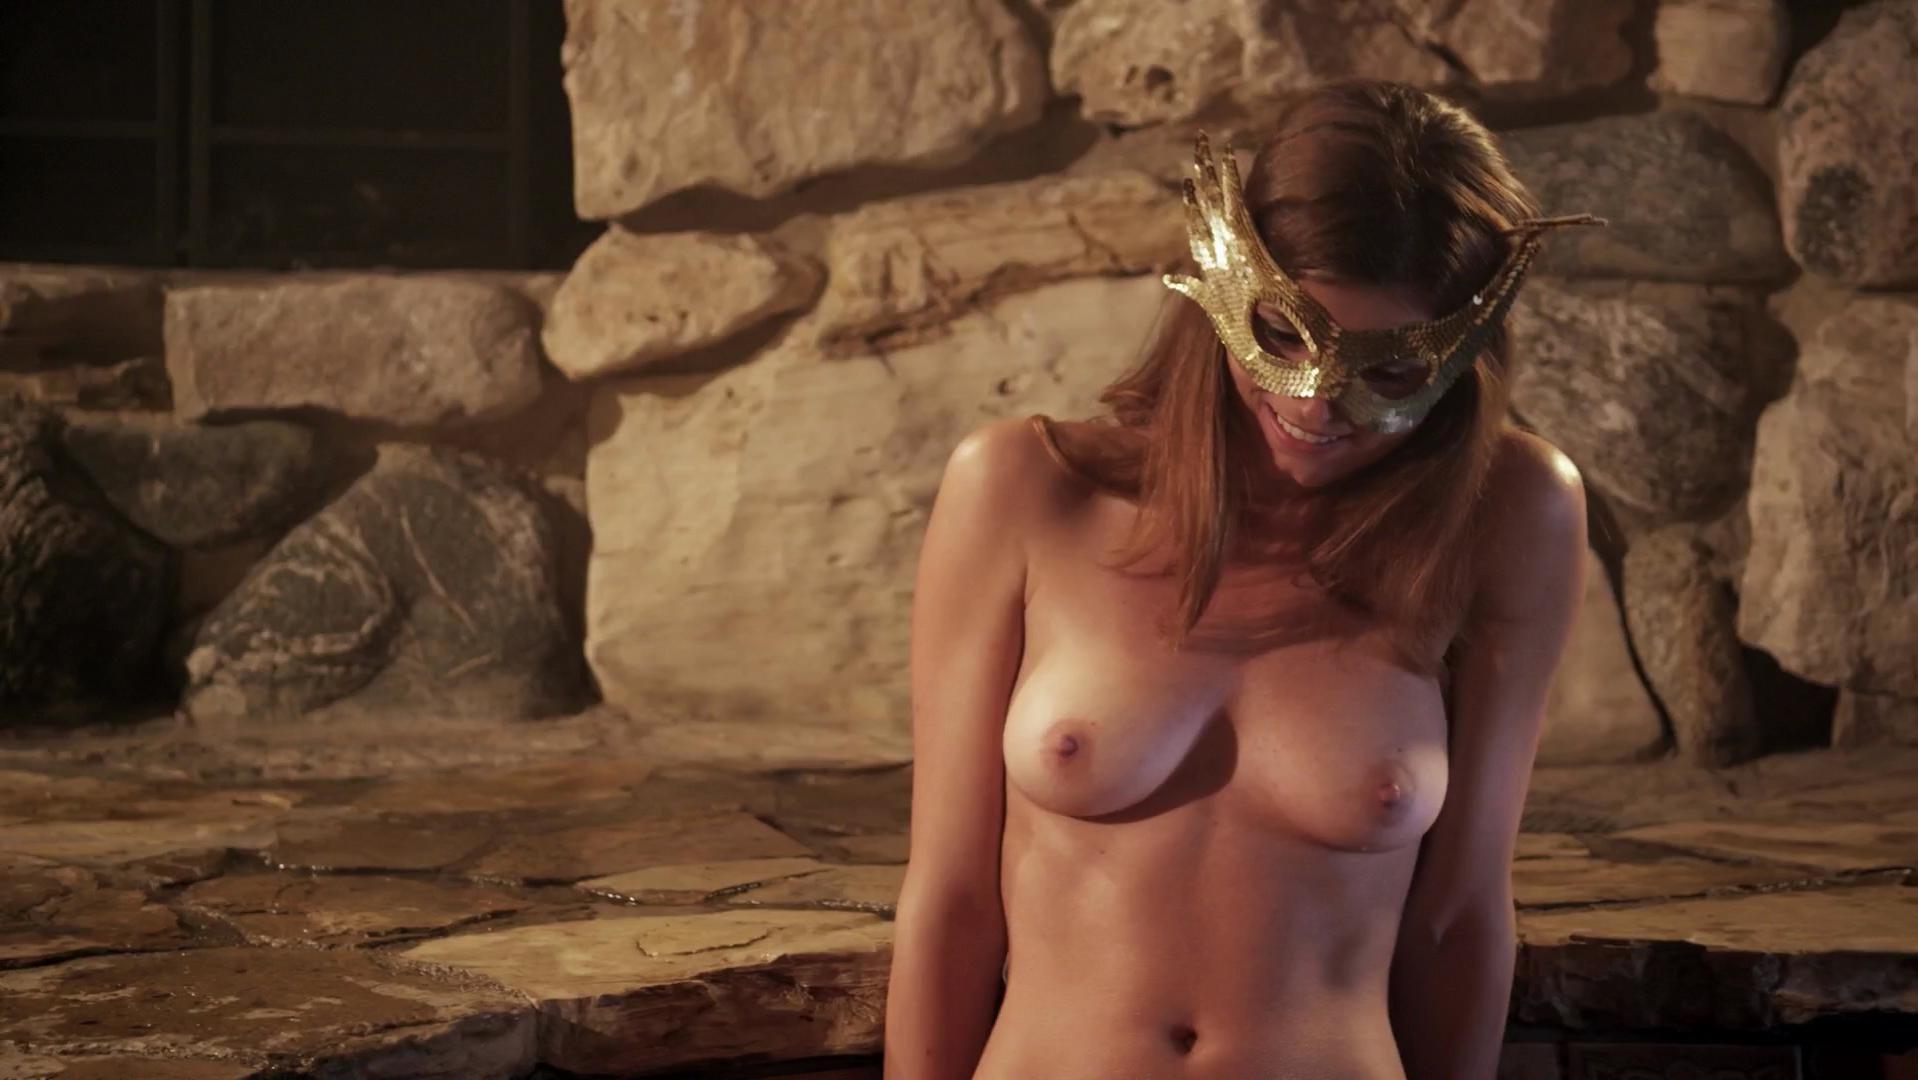 Movie actresses nude congratulate, your